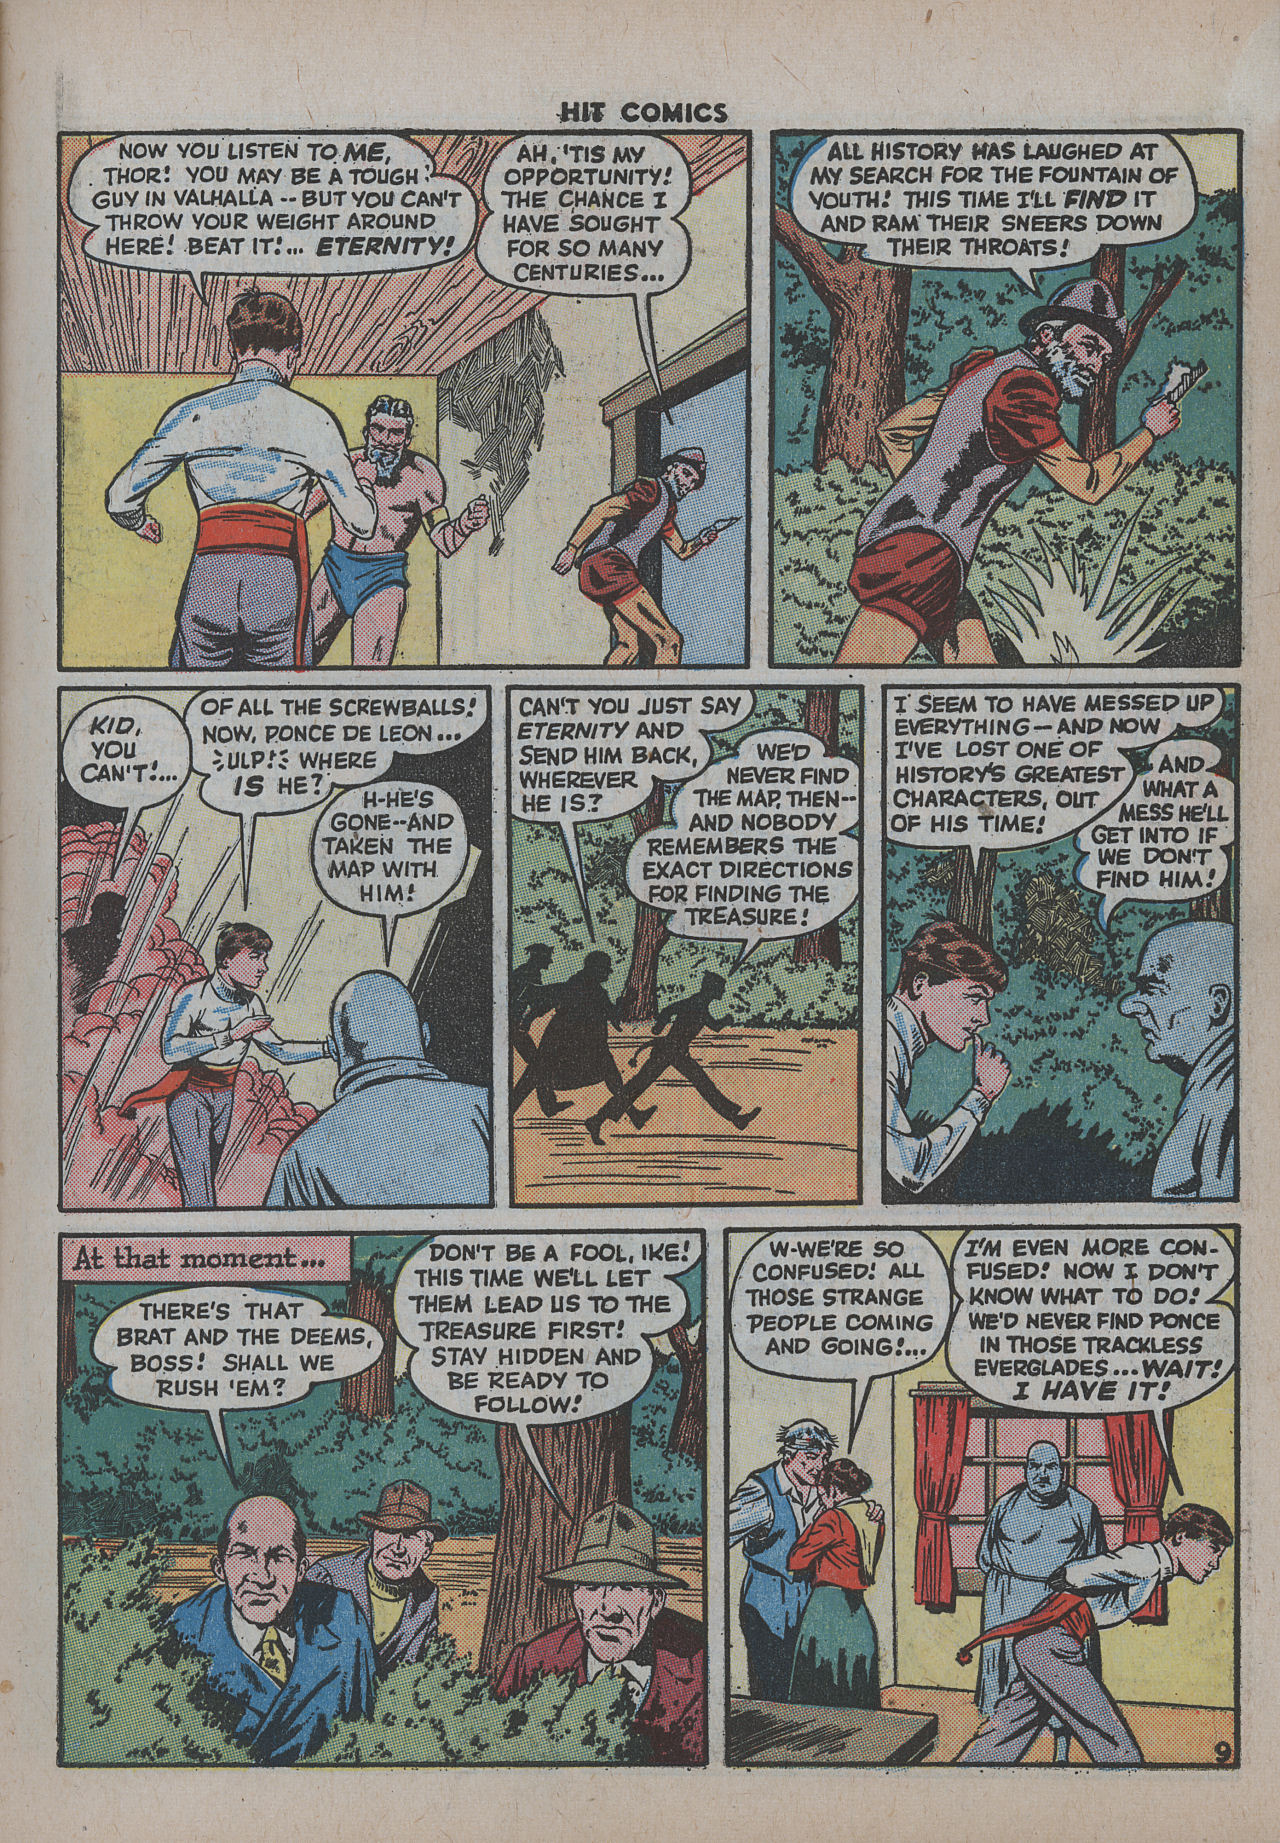 Read online Hit Comics comic -  Issue #38 - 14